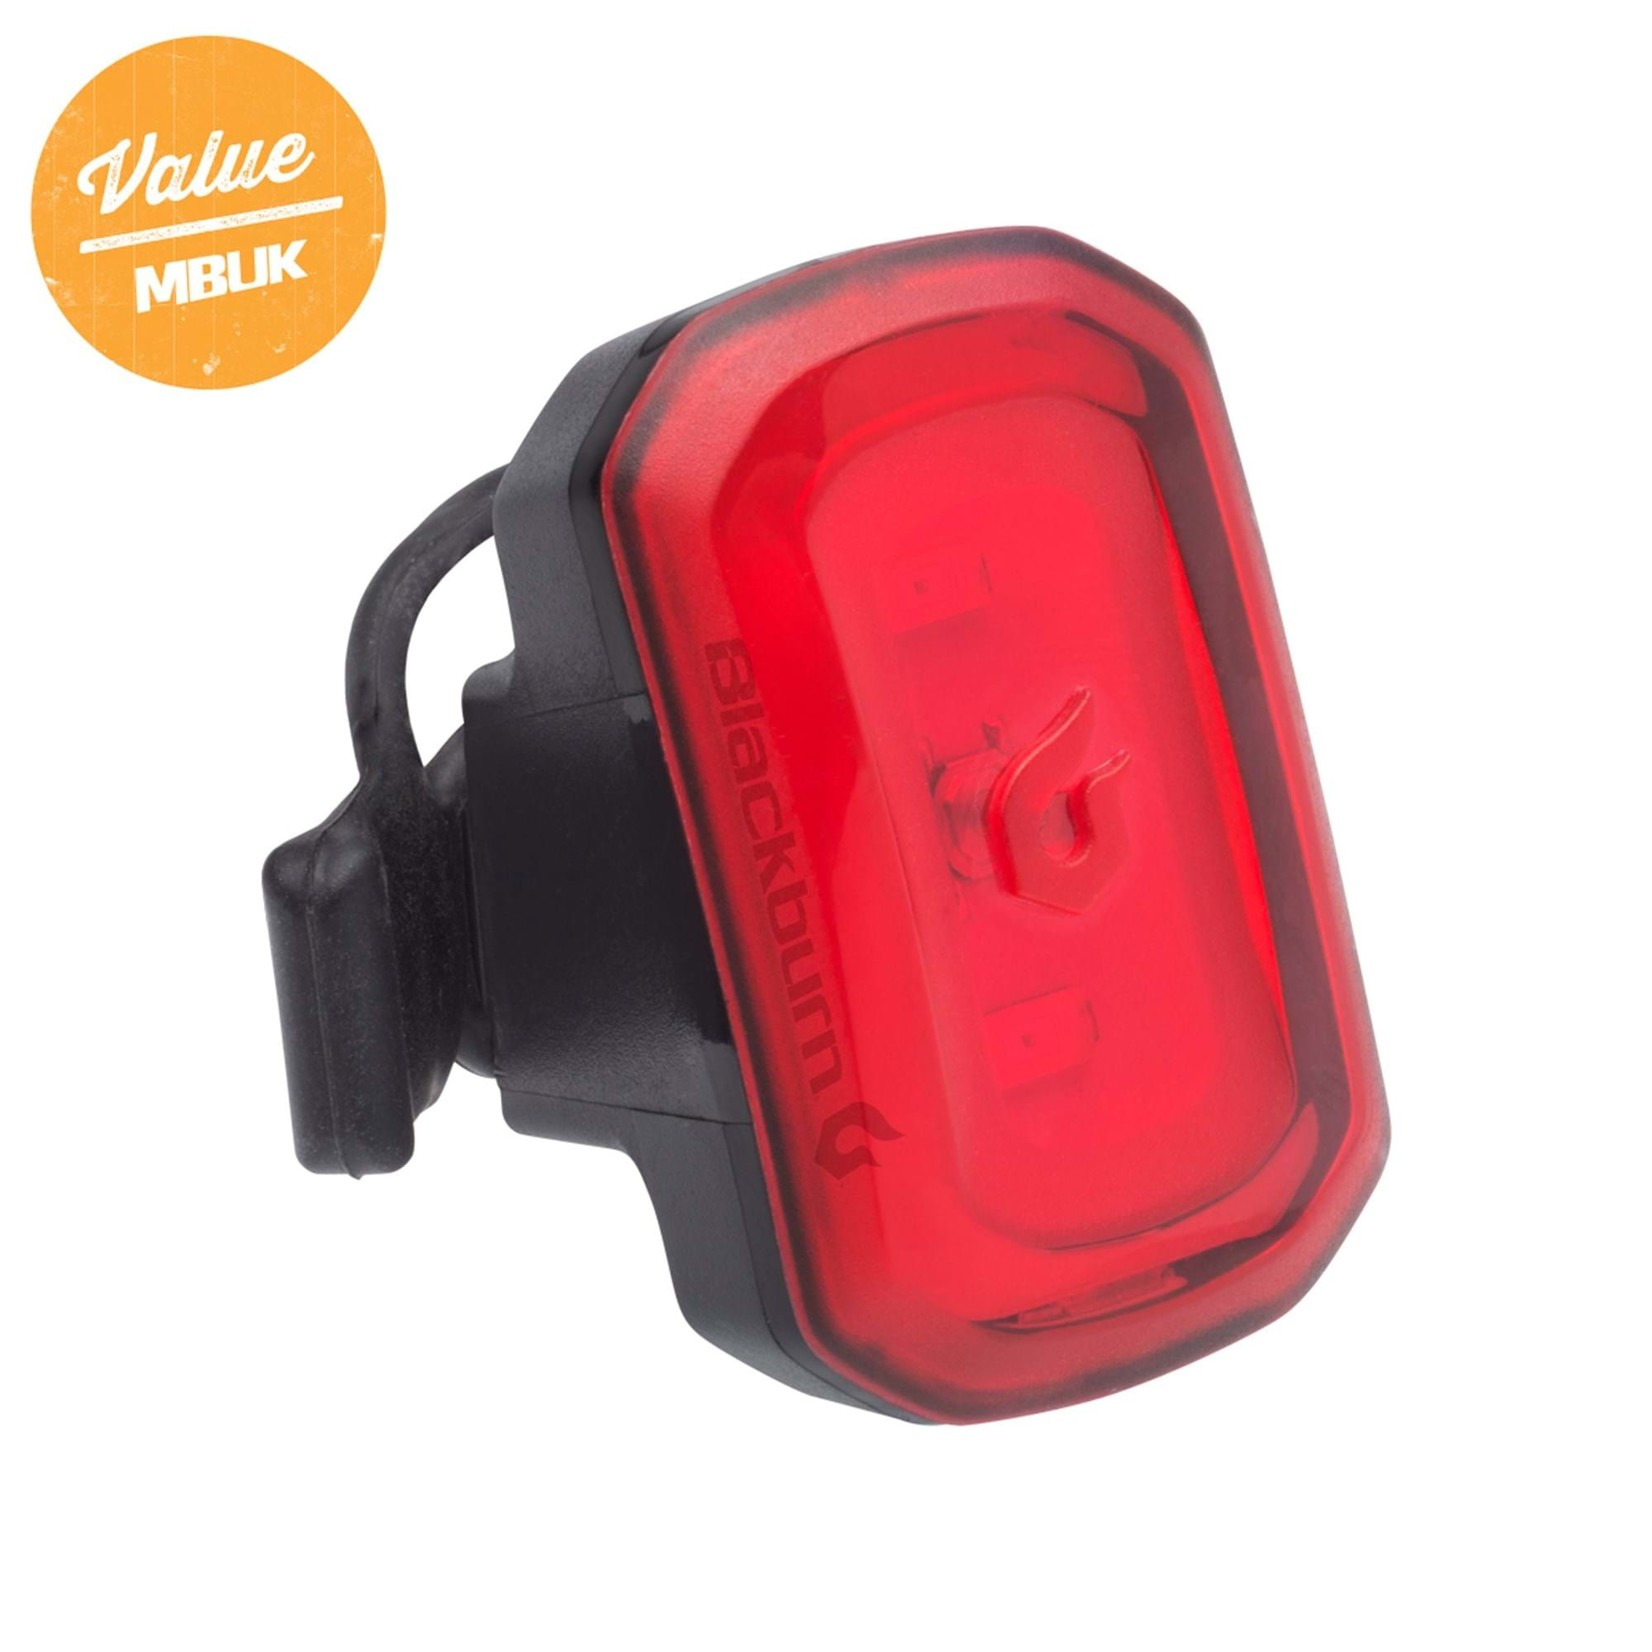 blackburn BLACKBURN CLICK USB RECHARGABLE REAR LIGHT